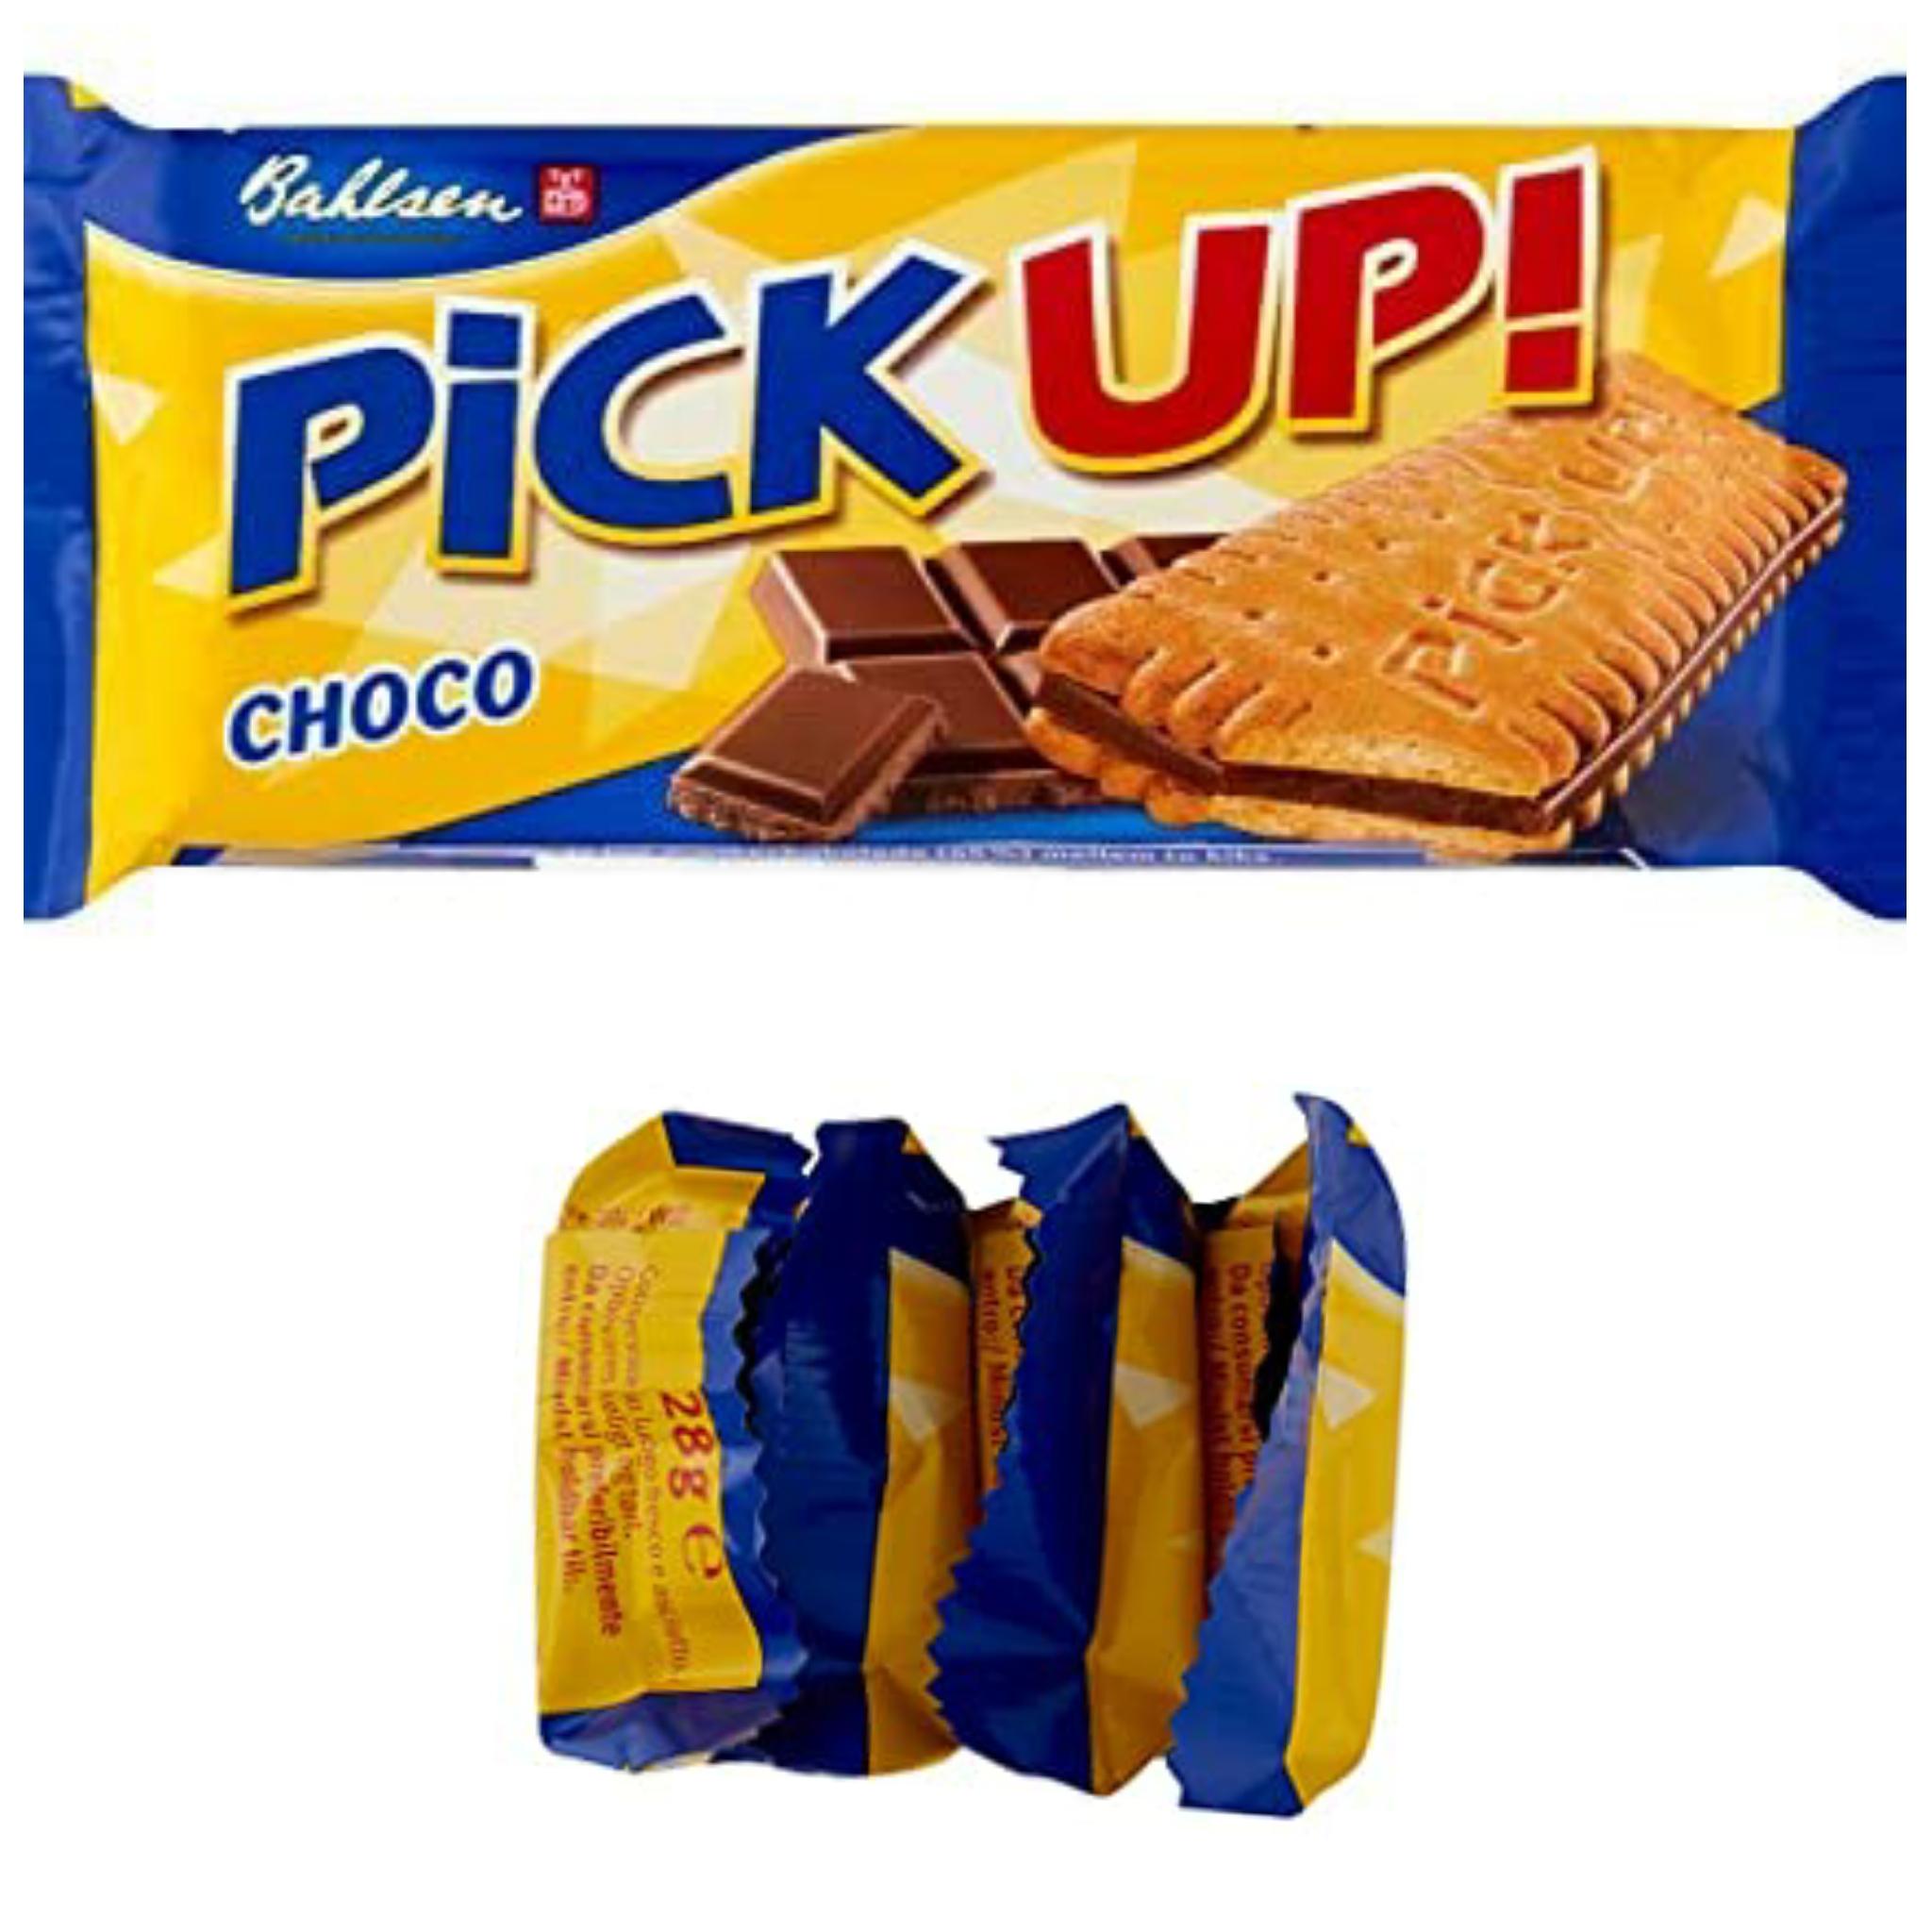 6x 4 Pick-Up Choco da 28gr